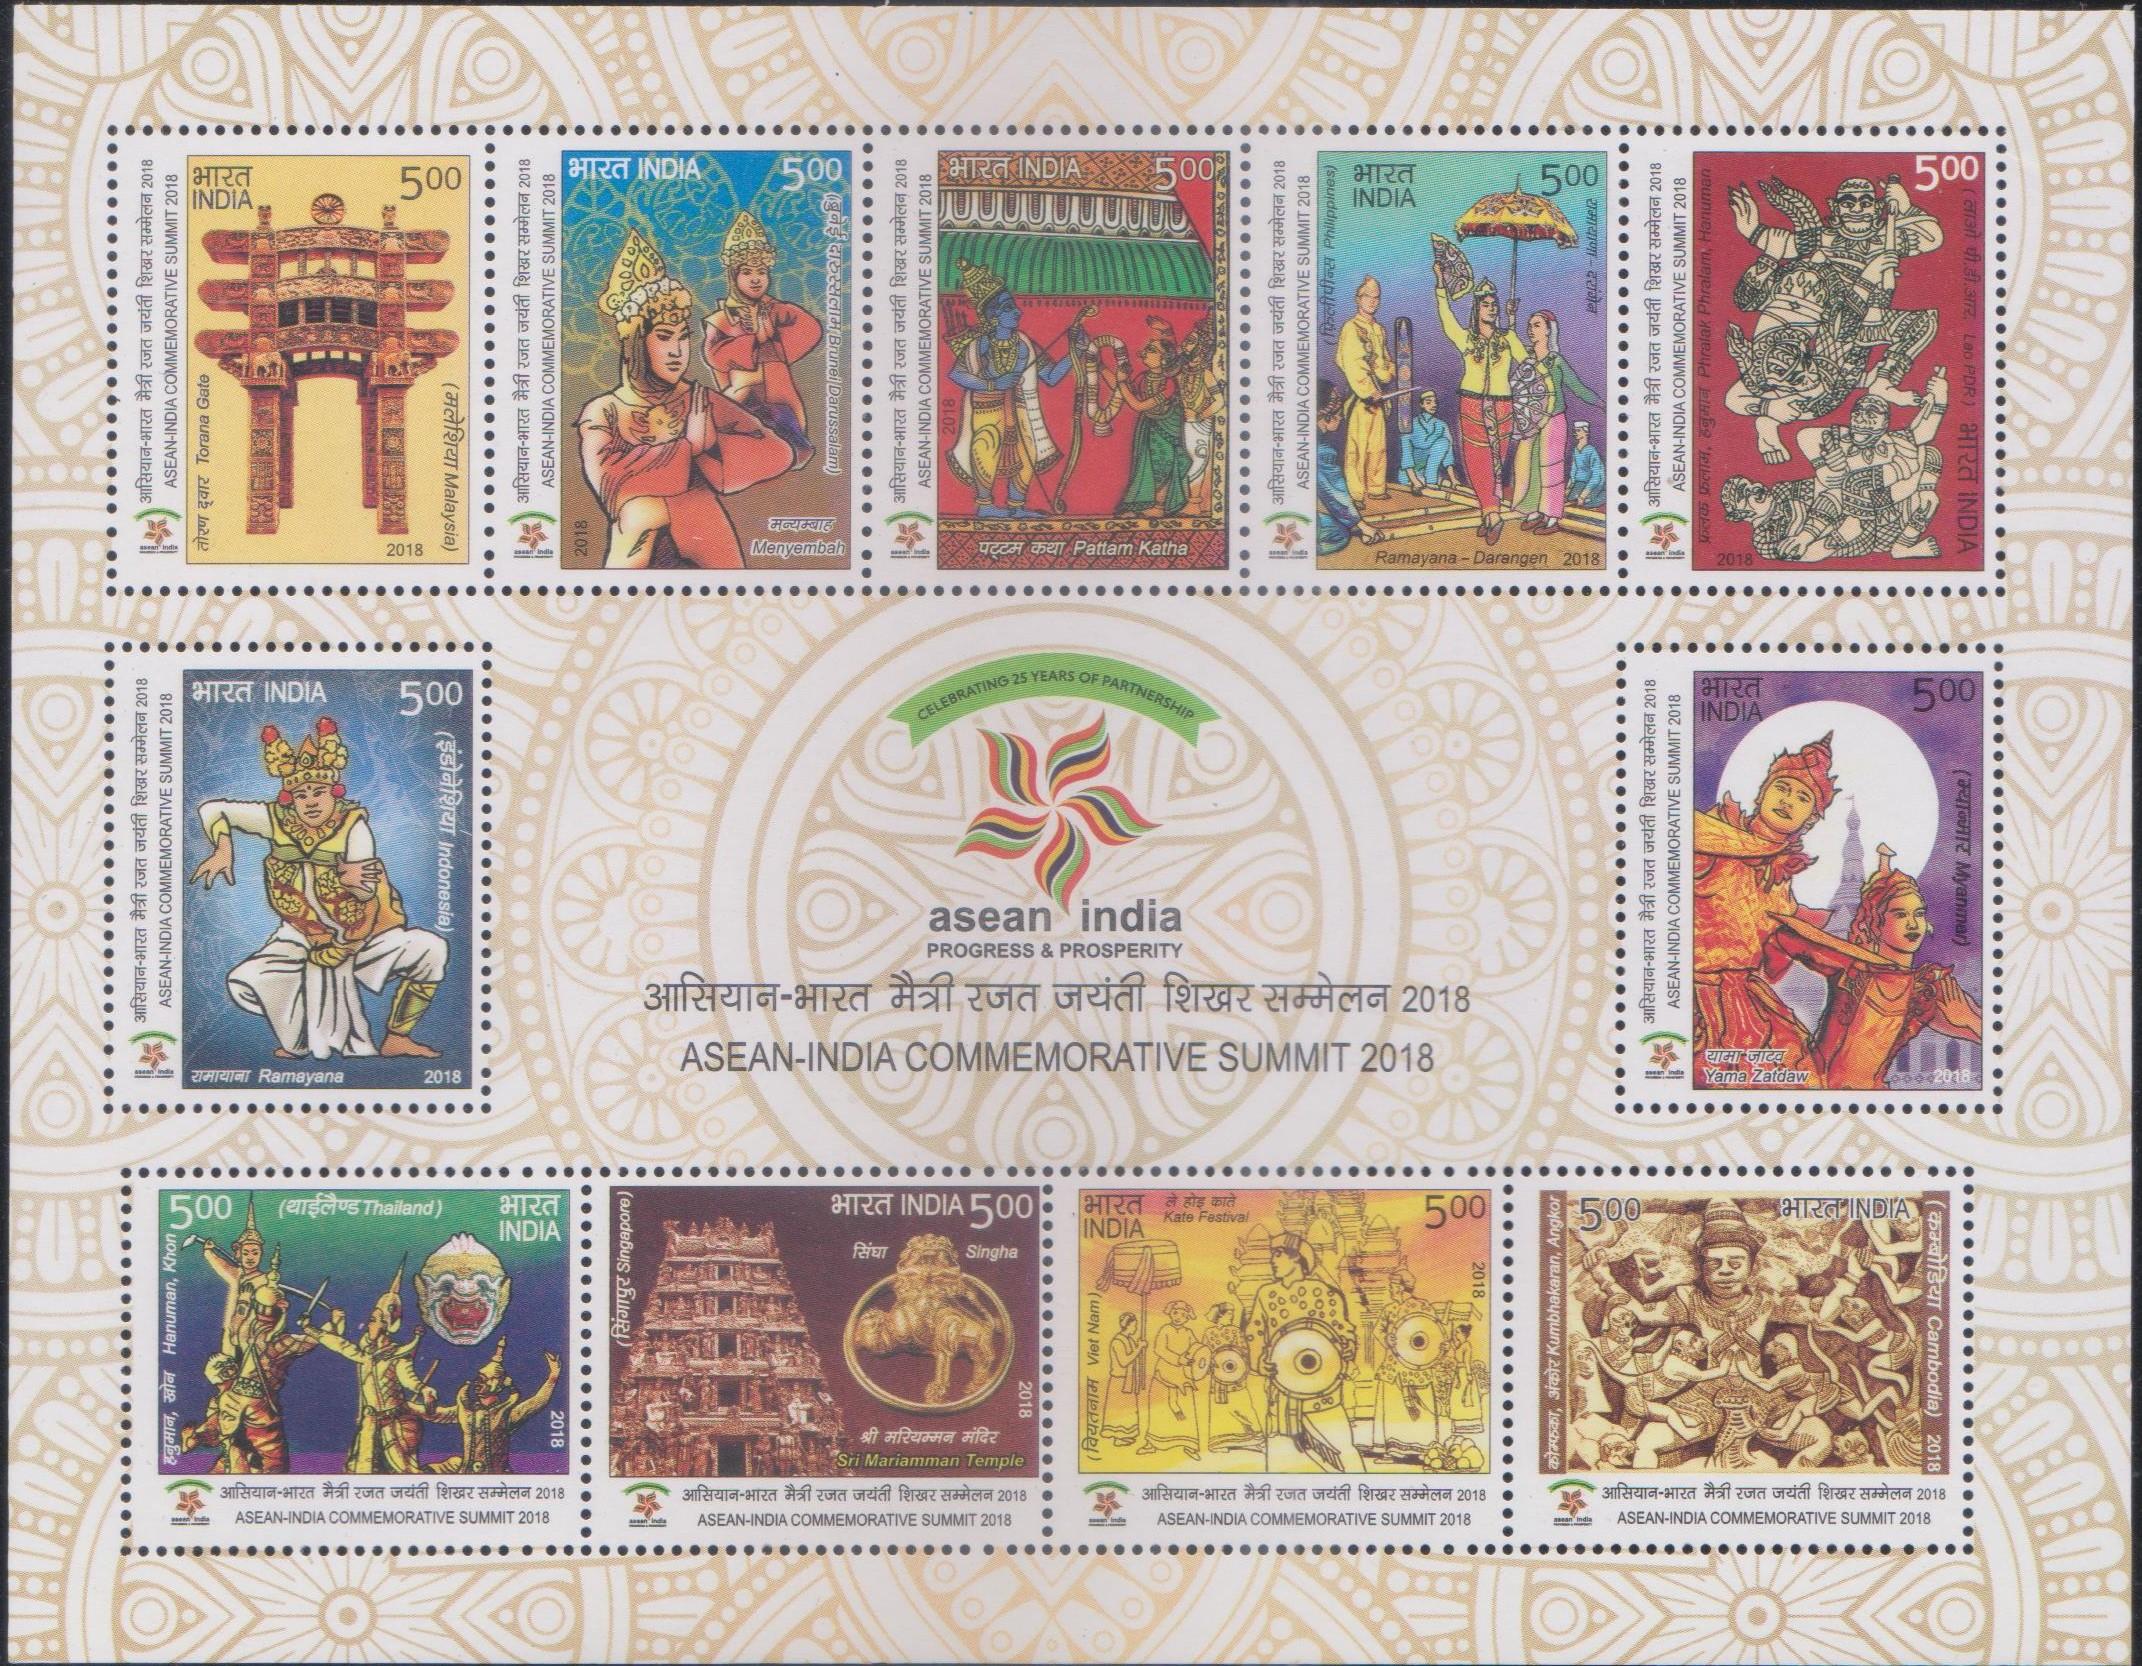 Ramayan : Southeast Asia Hindu Heritage